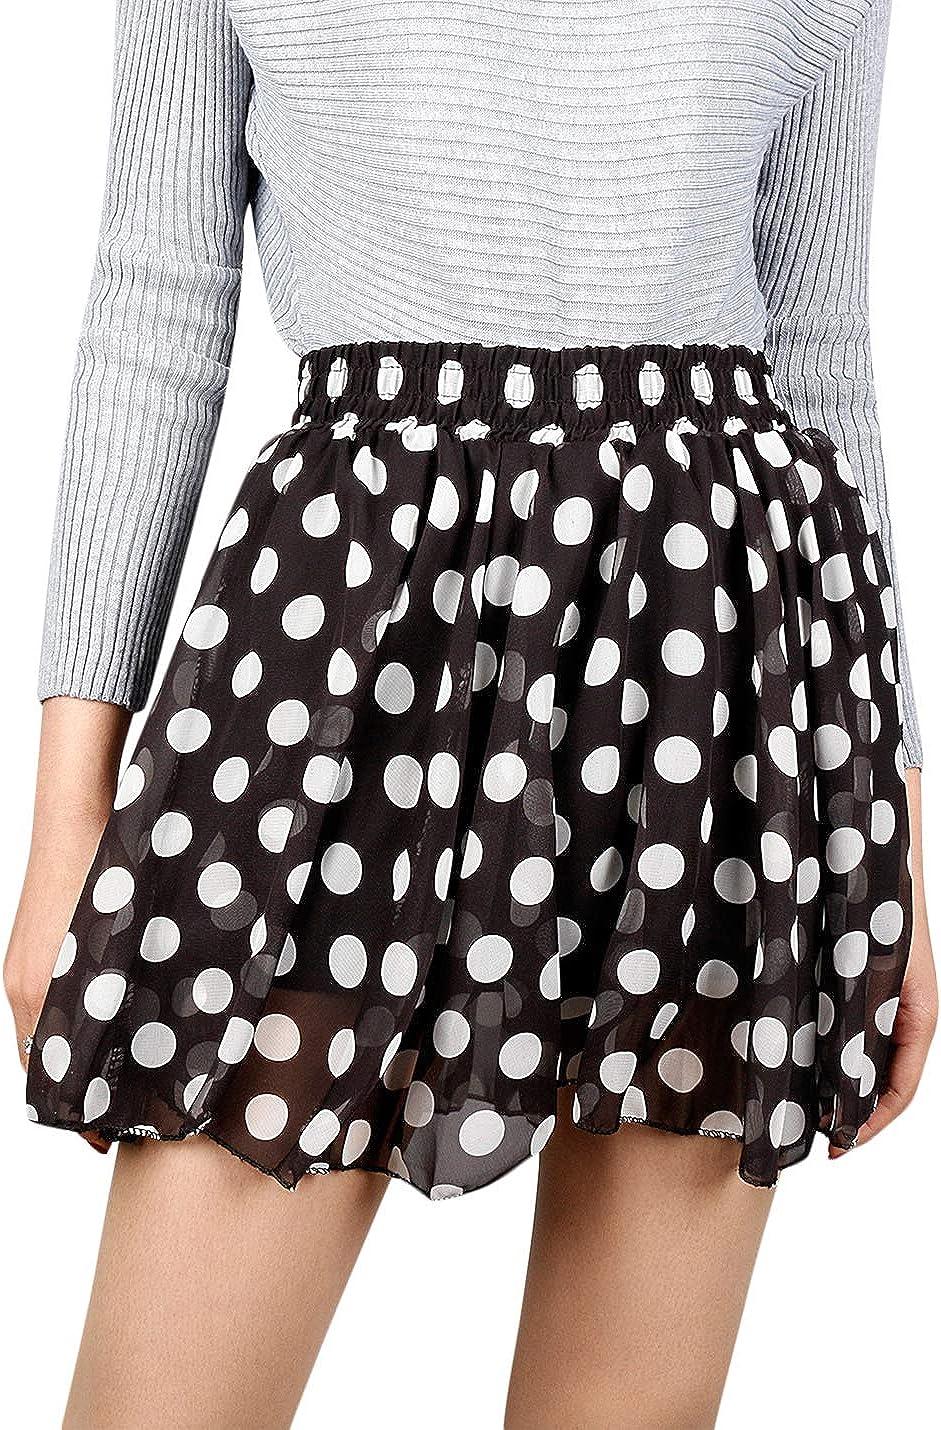 Uaneo Women's Spring Casual Elastic Waist Floral Dot Print Ruffled Mini Skirts (Black, Large)